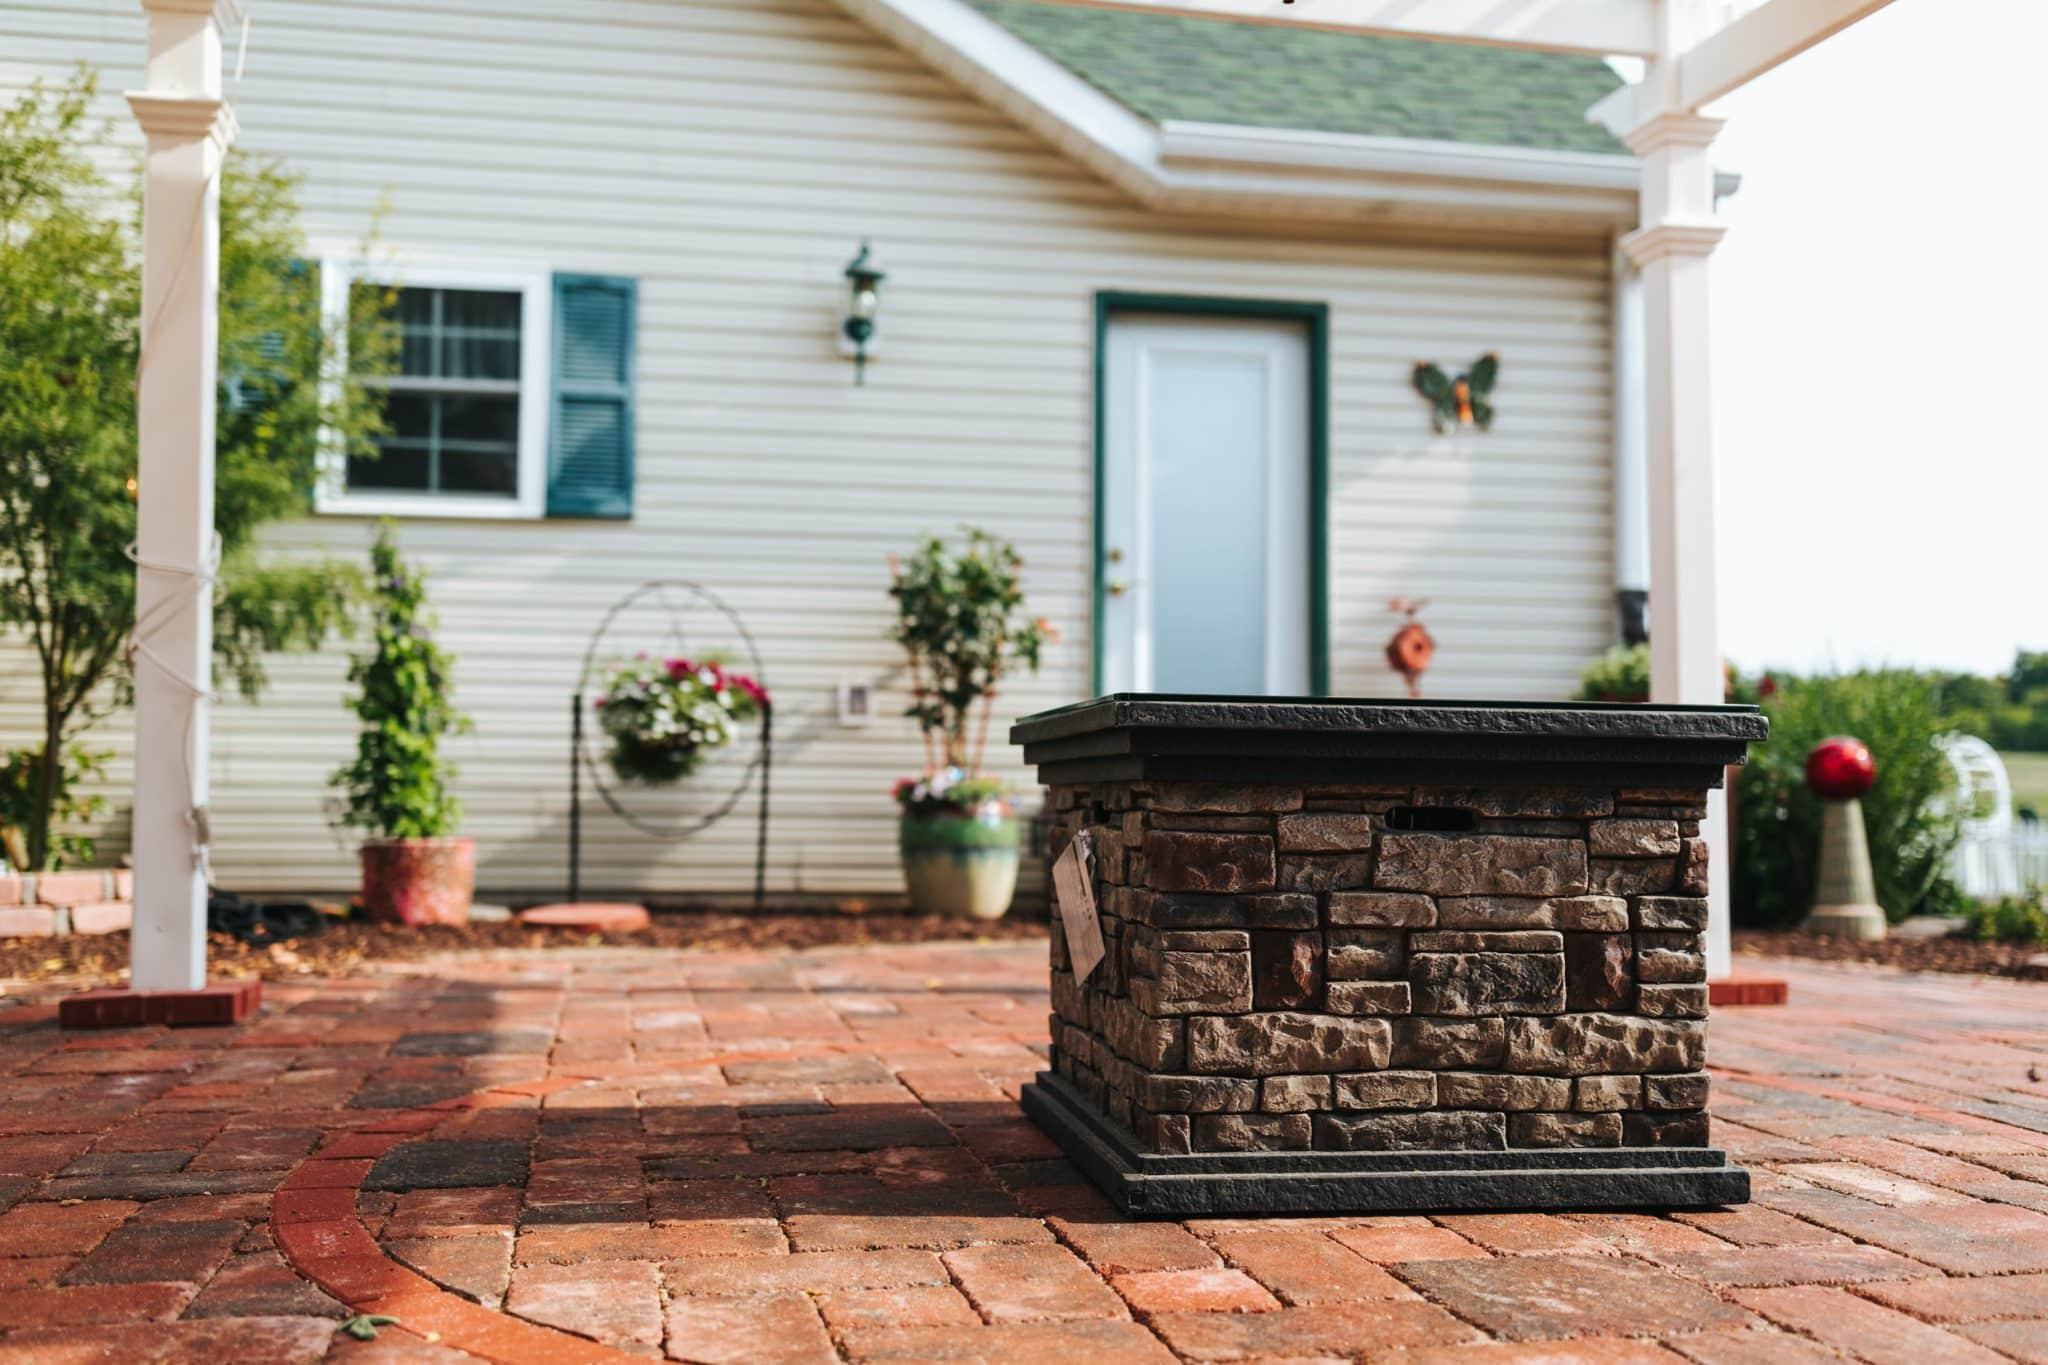 Porch - Window